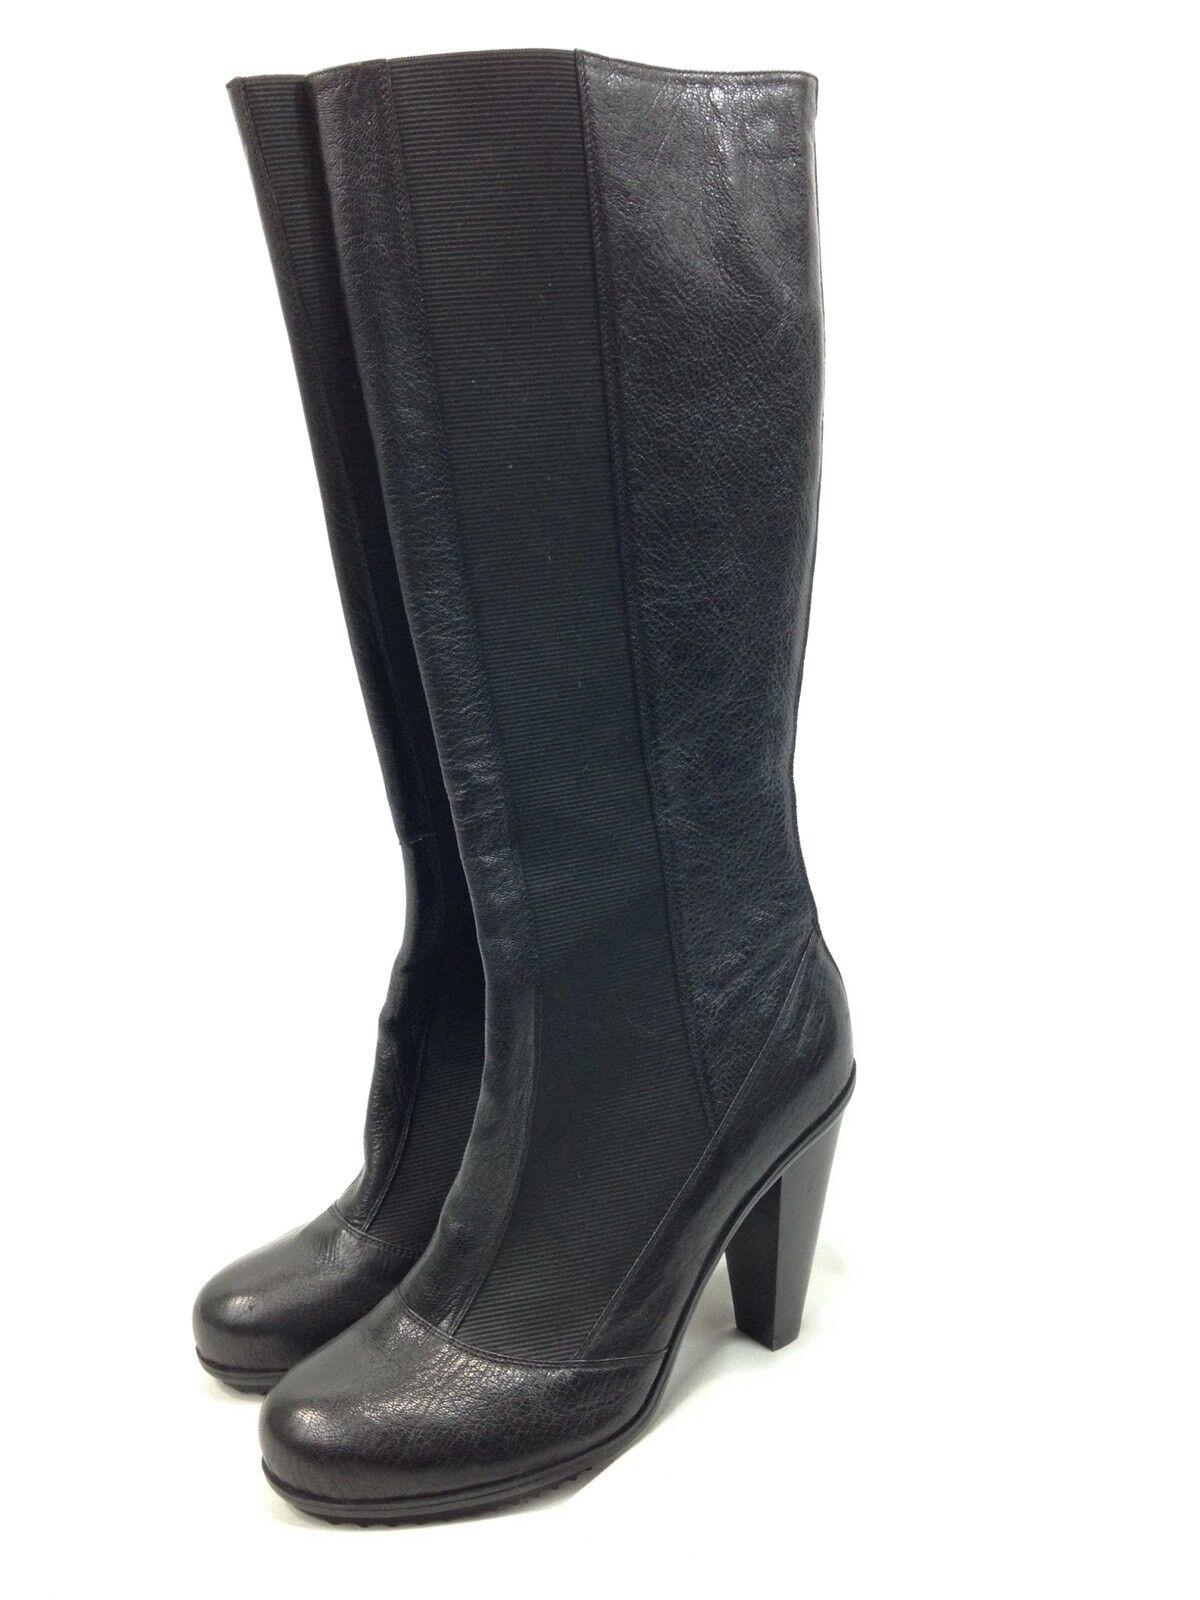 NEW women Karan DKNYC Roana Tall Boots Womens 9 Black Zip Heels Pumps Elastic